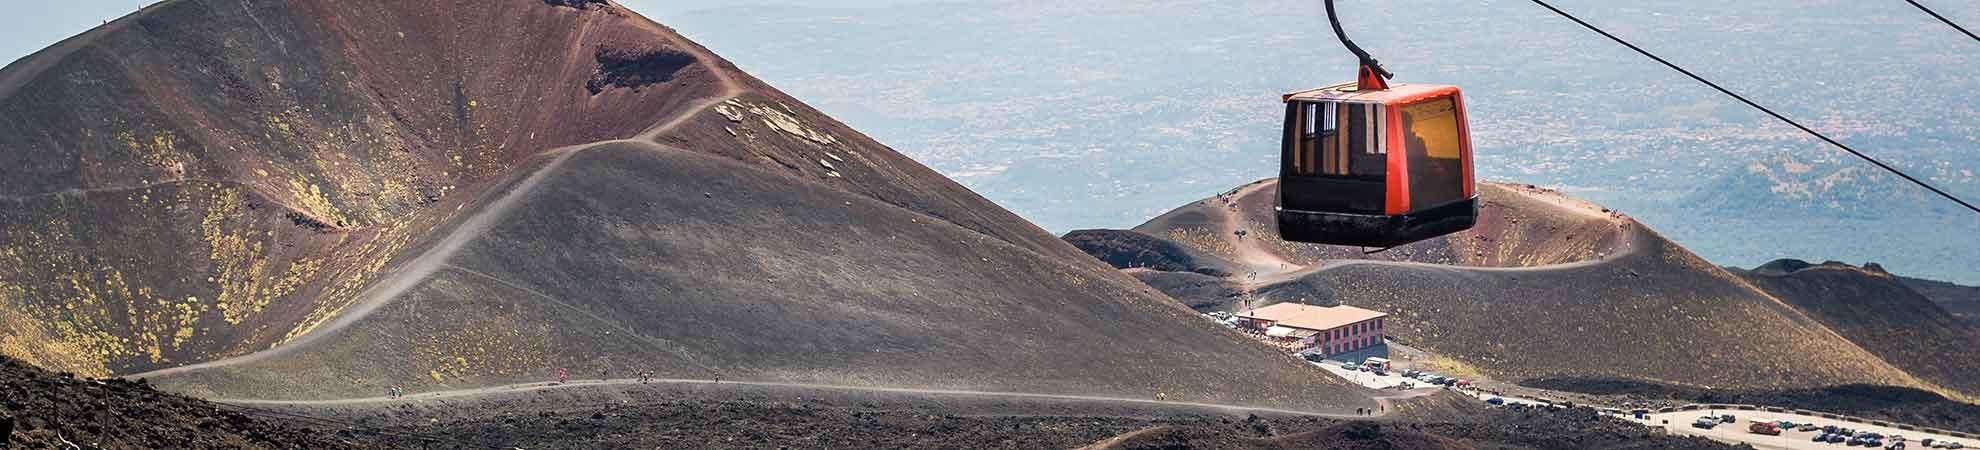 Voyage Etna